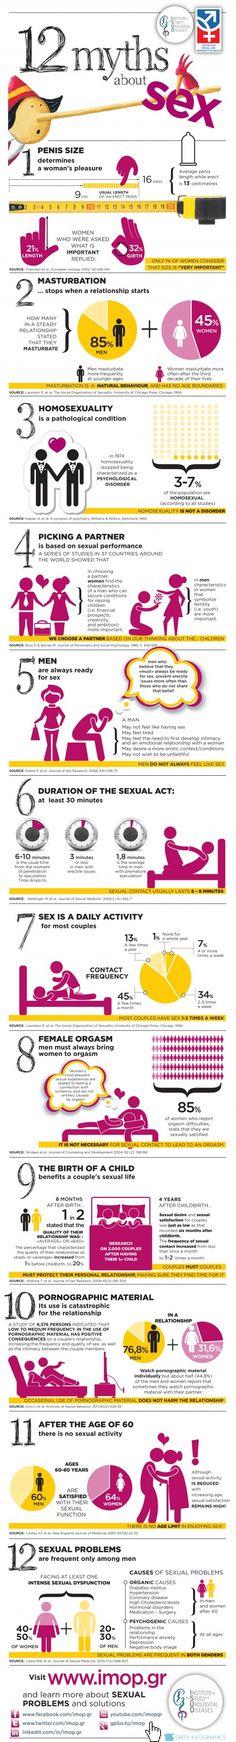 12 Myths about Sex